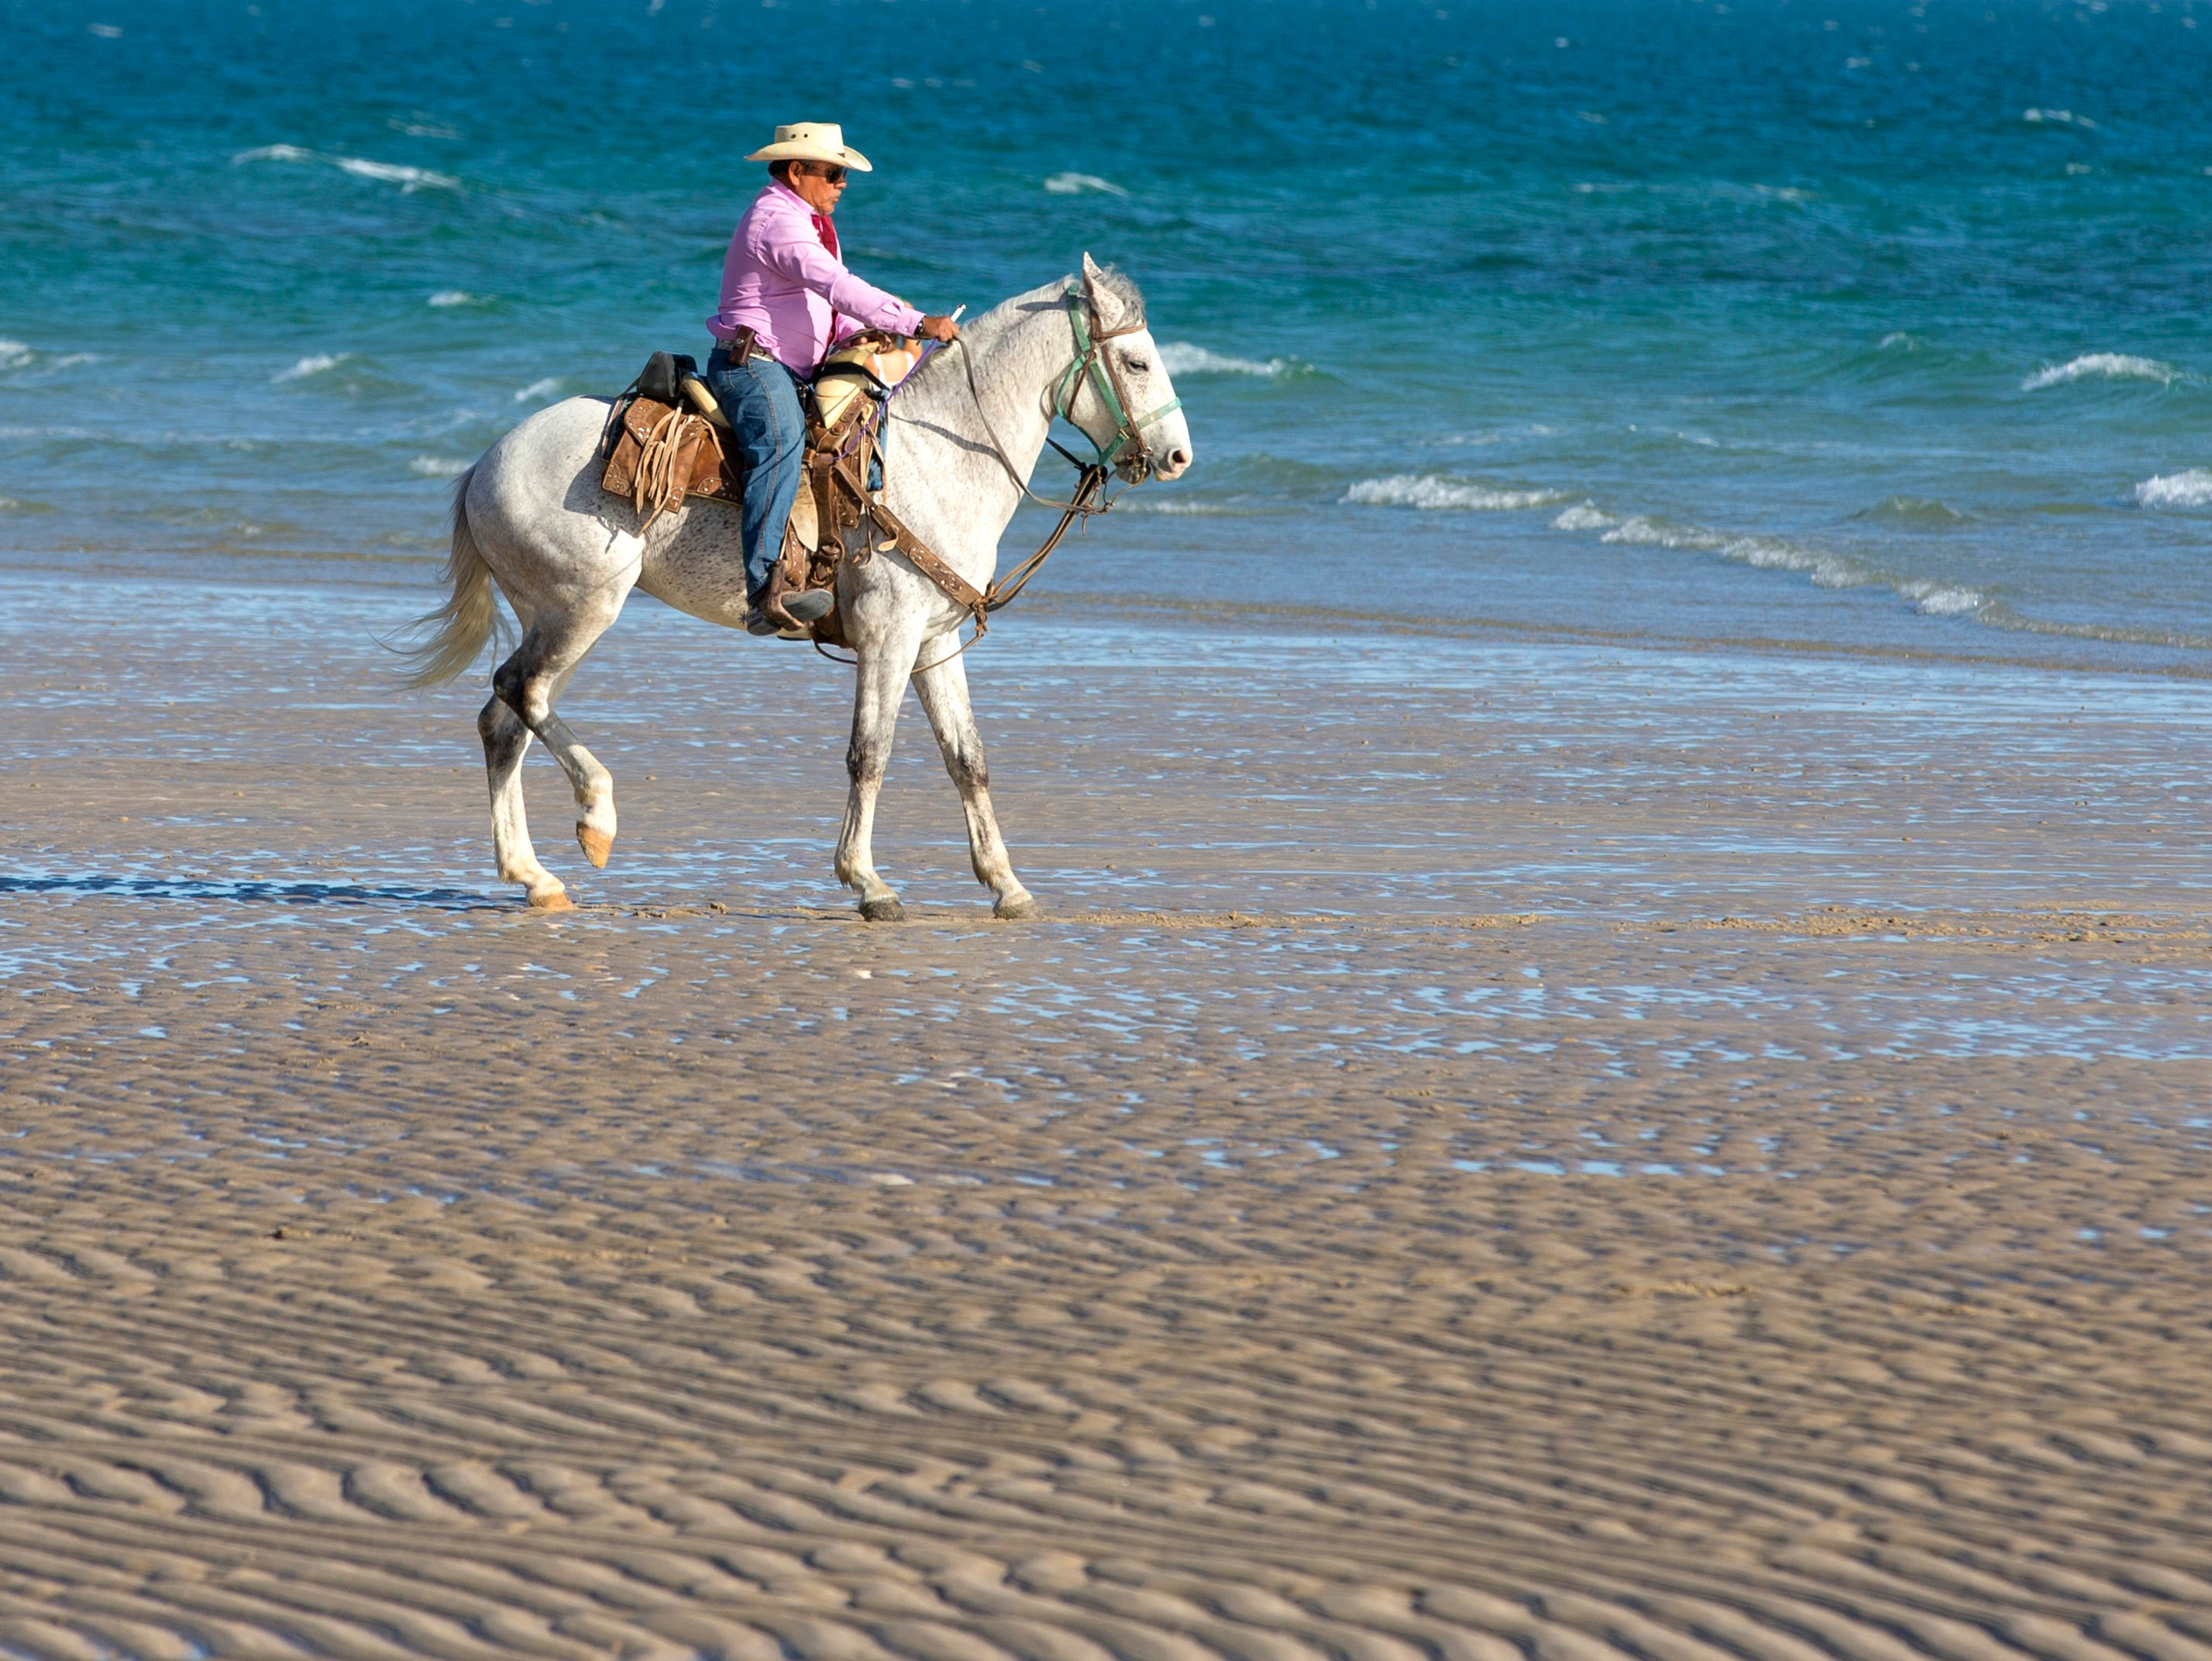 Clemente Vasquez Montoya rides his horse, Morro,  on Sandy Beach in Puerto Penasco, Mexico. Montoya rents horses for riding on the beach.